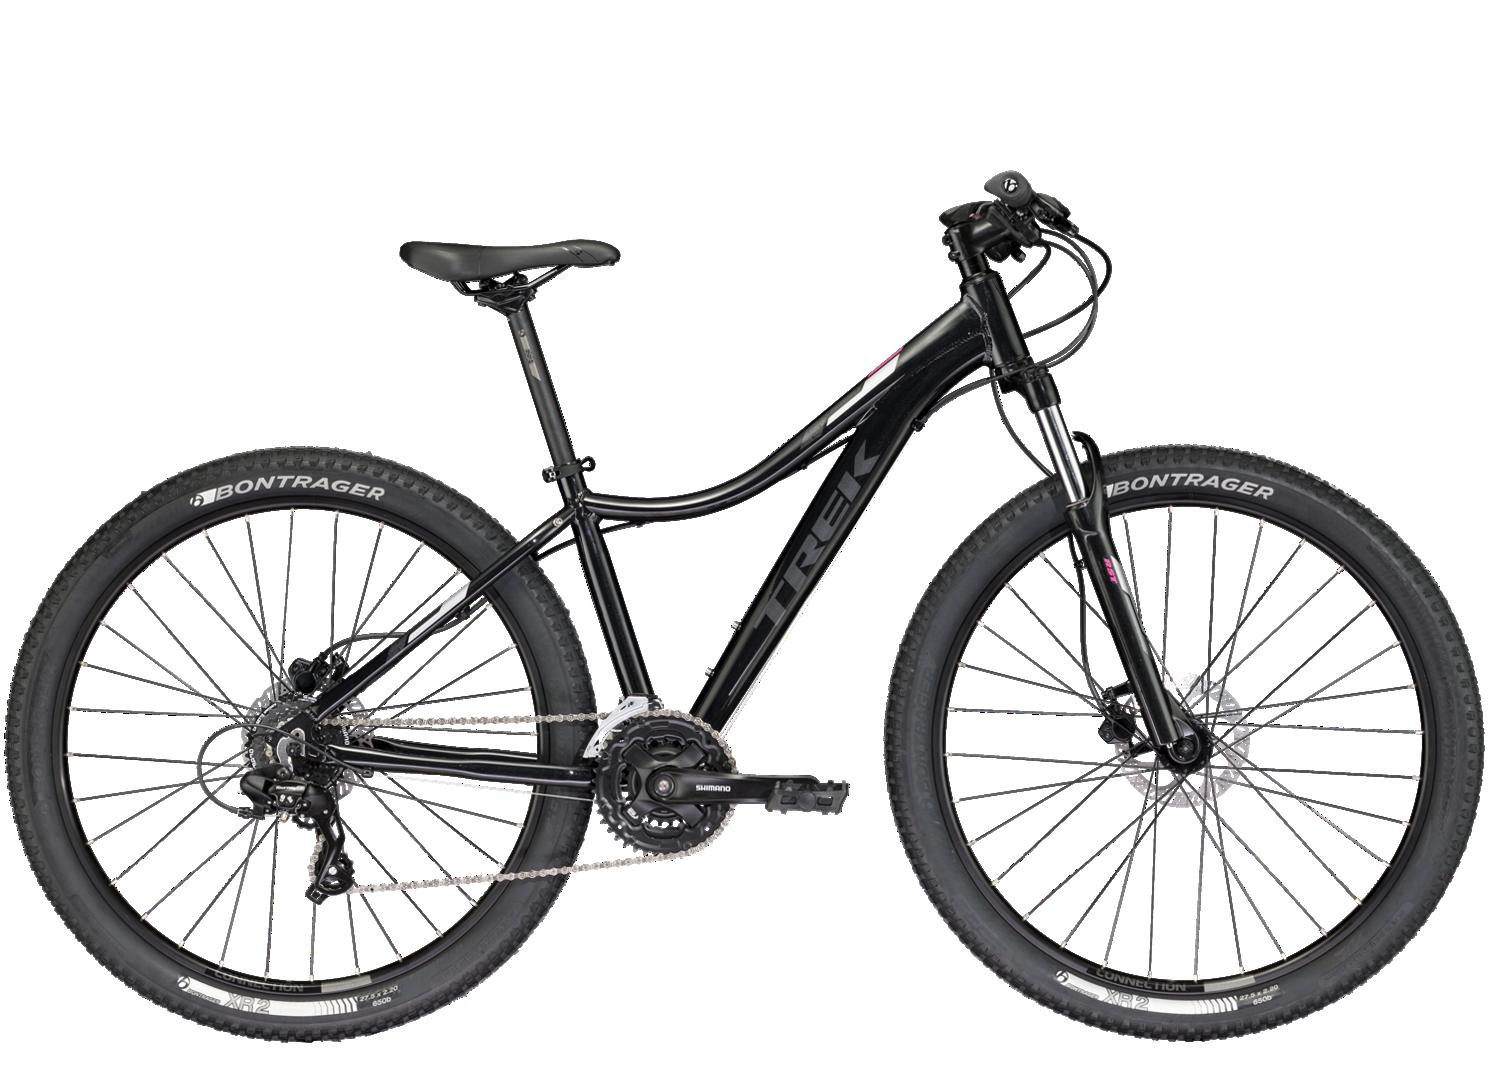 8fb9c1e8276 2017 Skye SL Women's - Bike Archive - Trek Bicycle